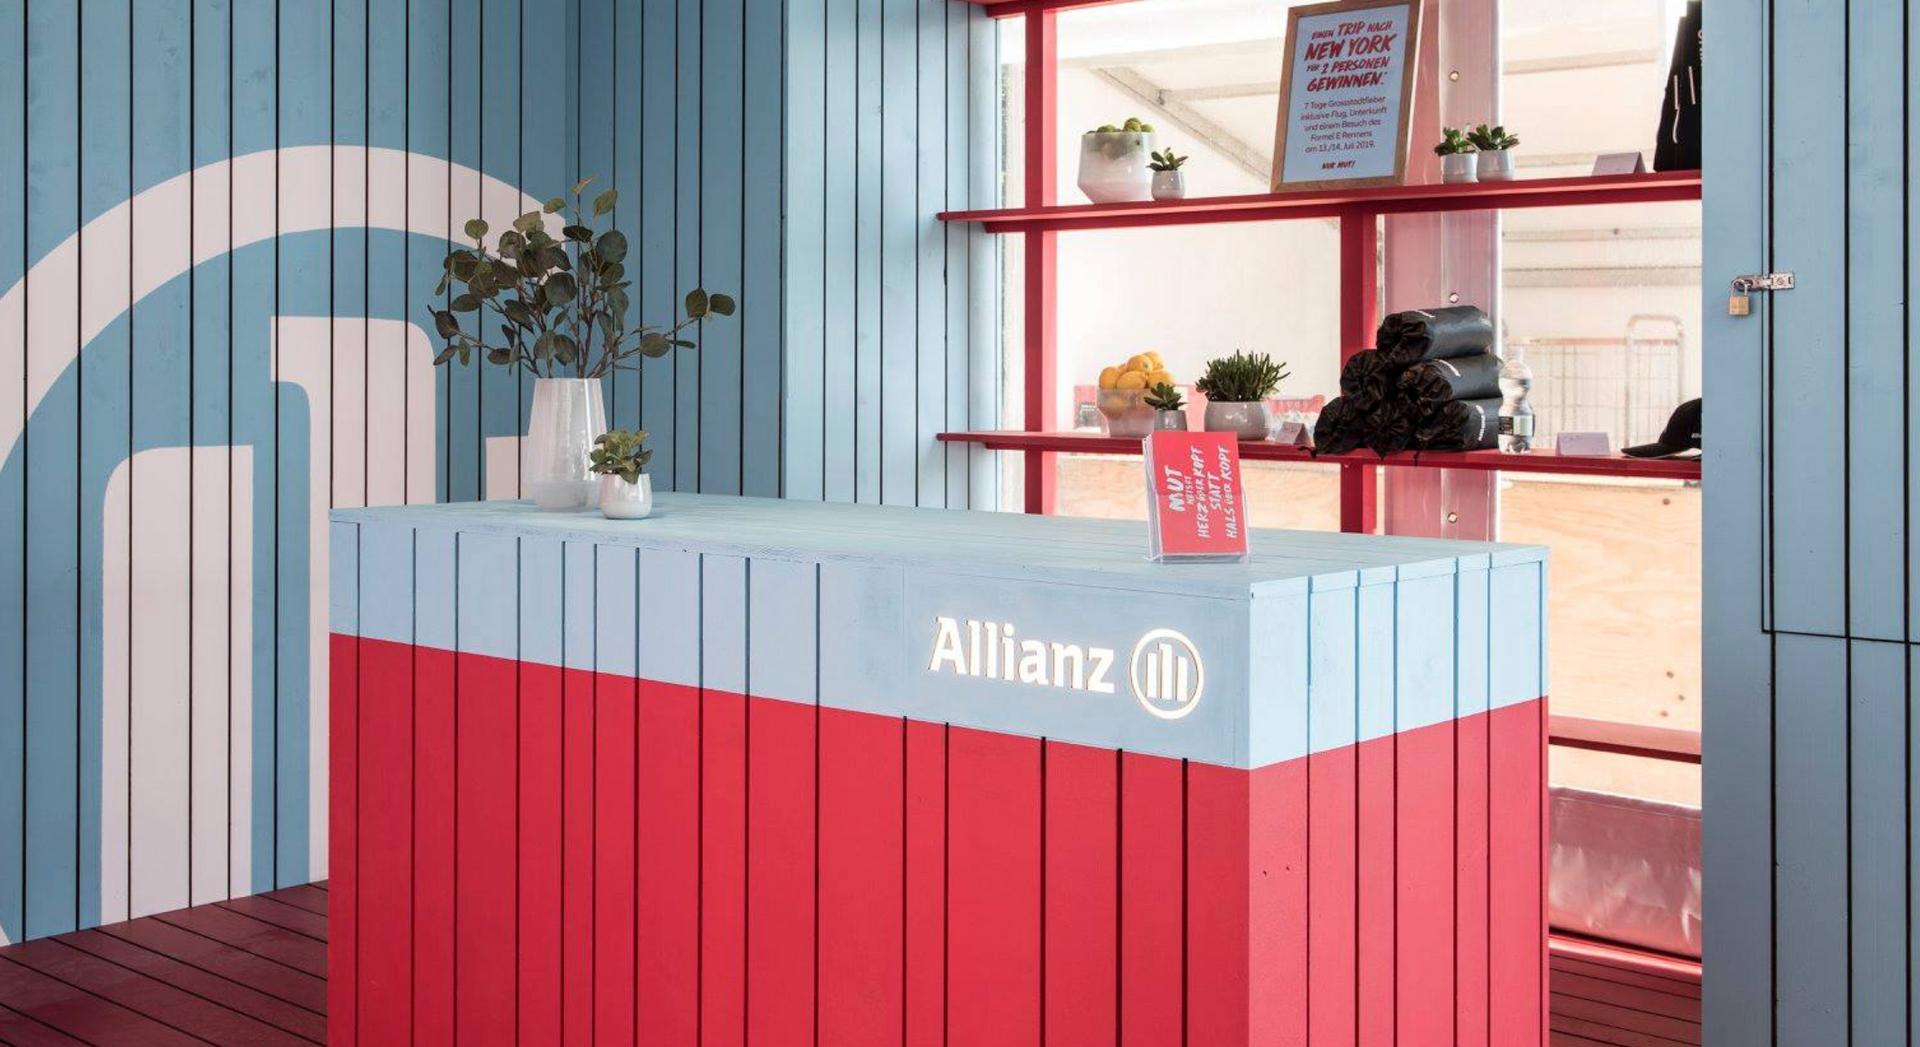 ALLIANZ, CINEMA, 2018